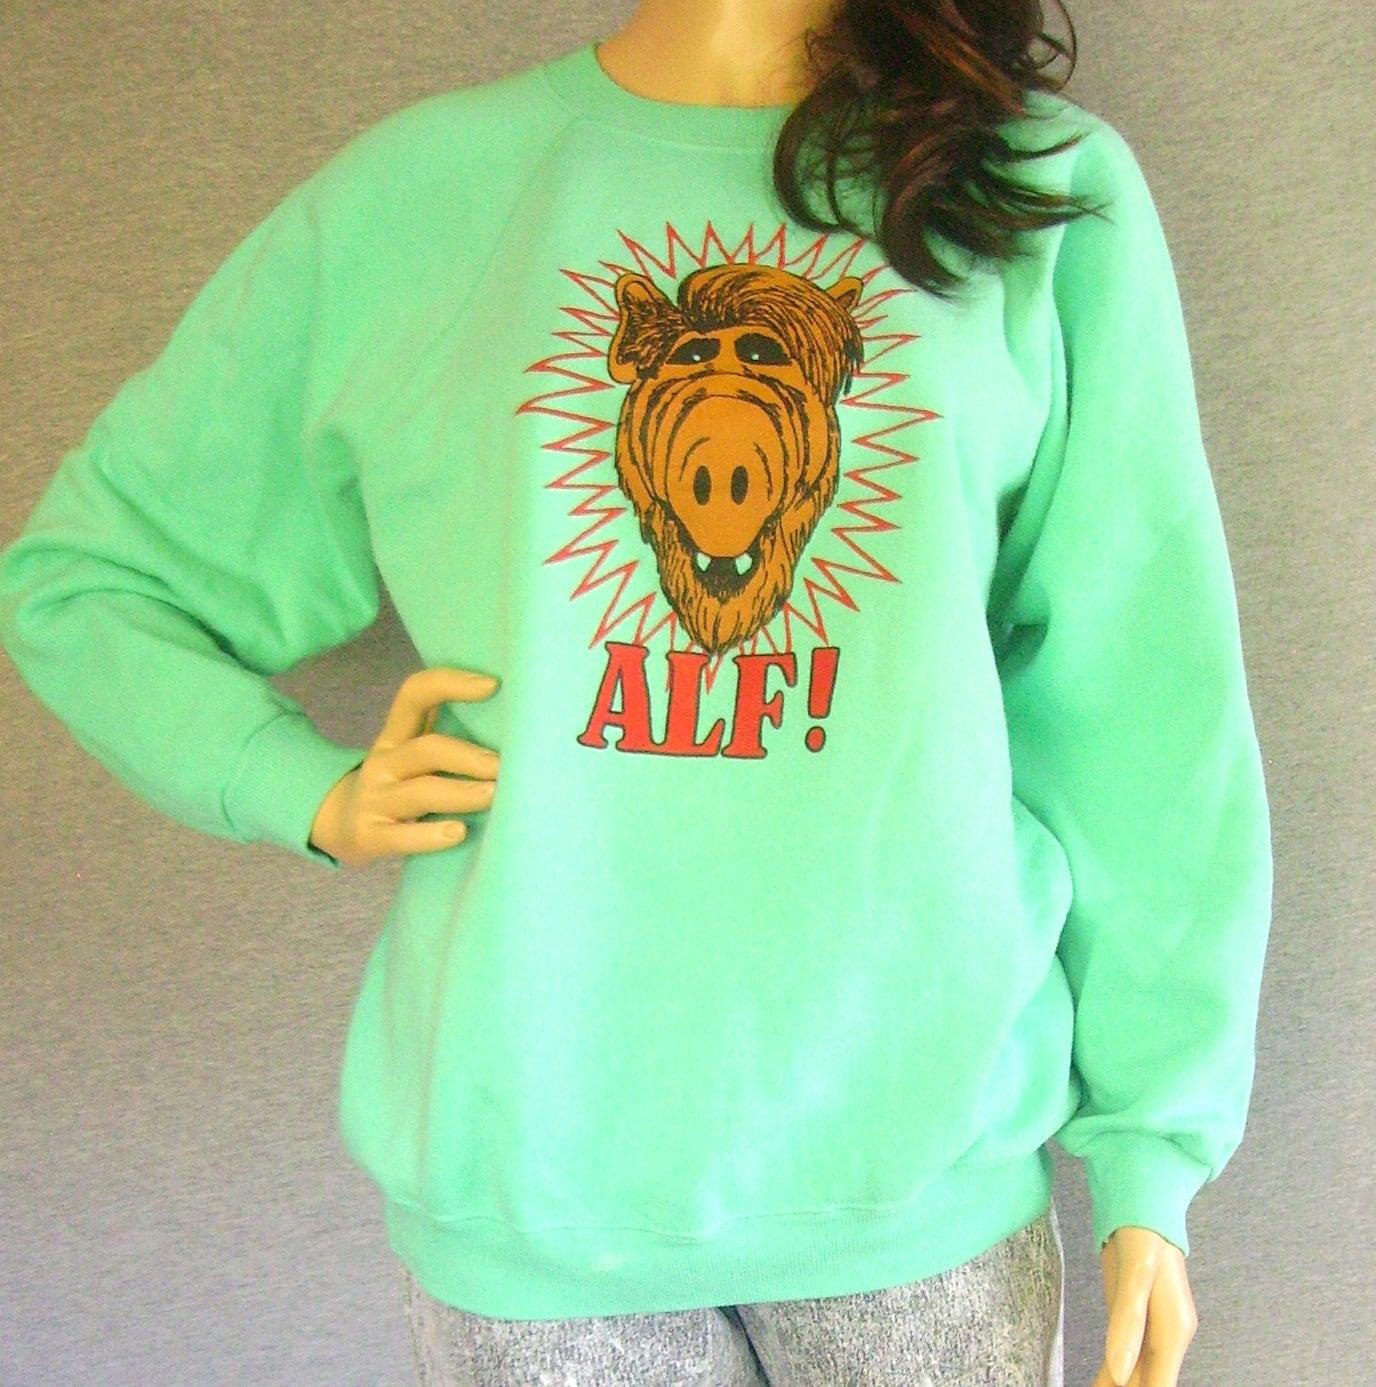 80s ALF Shirt / Pastel Shirt / Vintage 80s Alf Sweatshirt